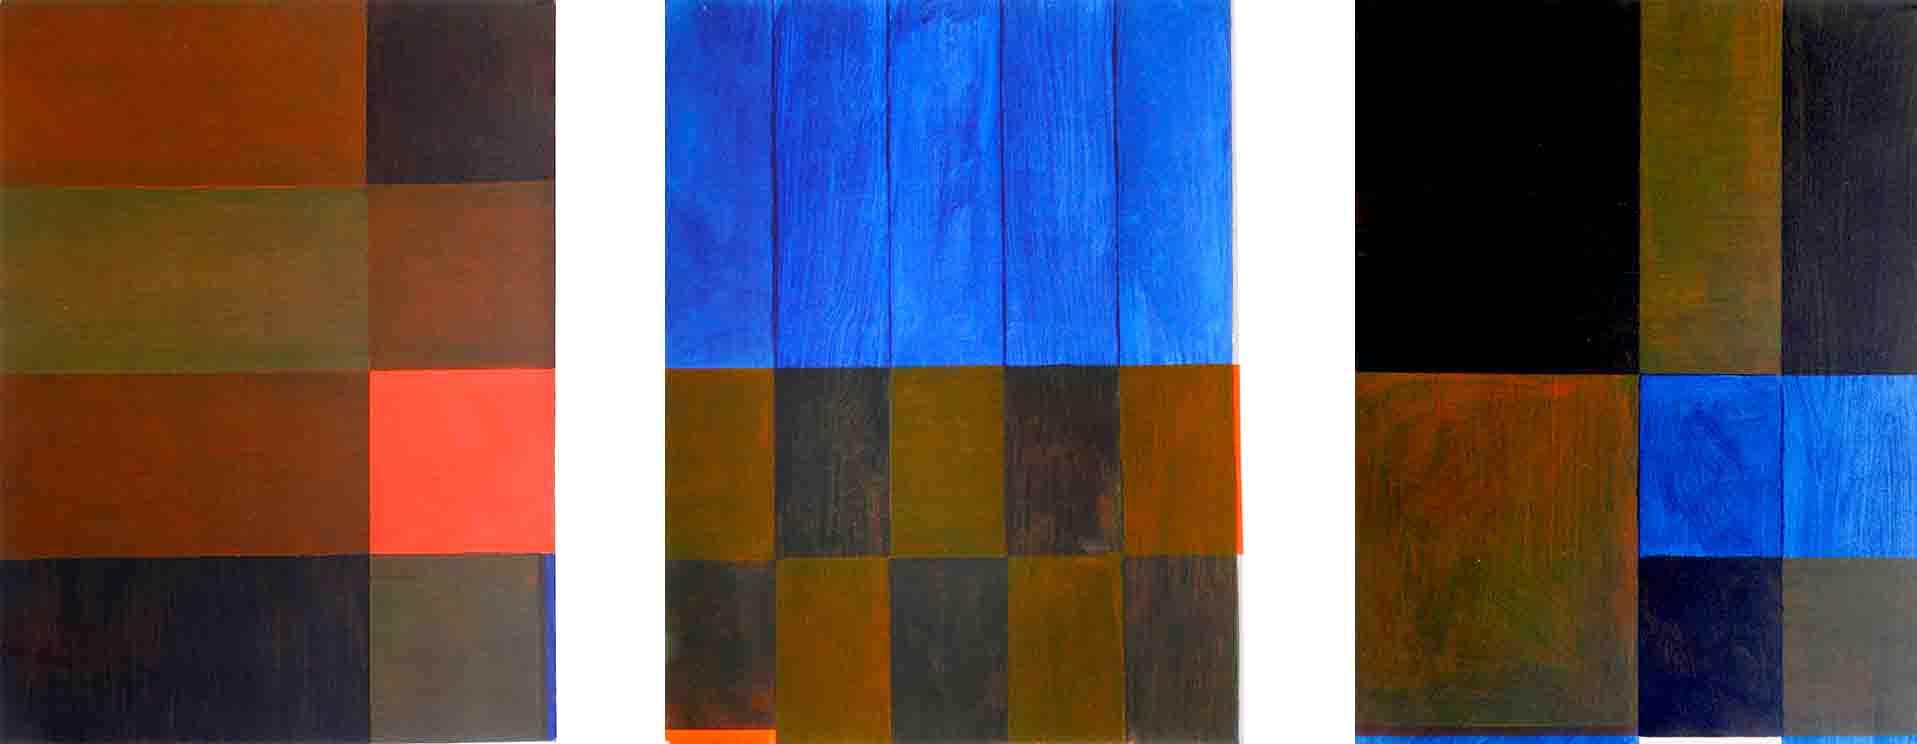 ALBERT AYME - Paradigme du Bleu Jaune Rouge - Tresse des 3 primaires - 1979